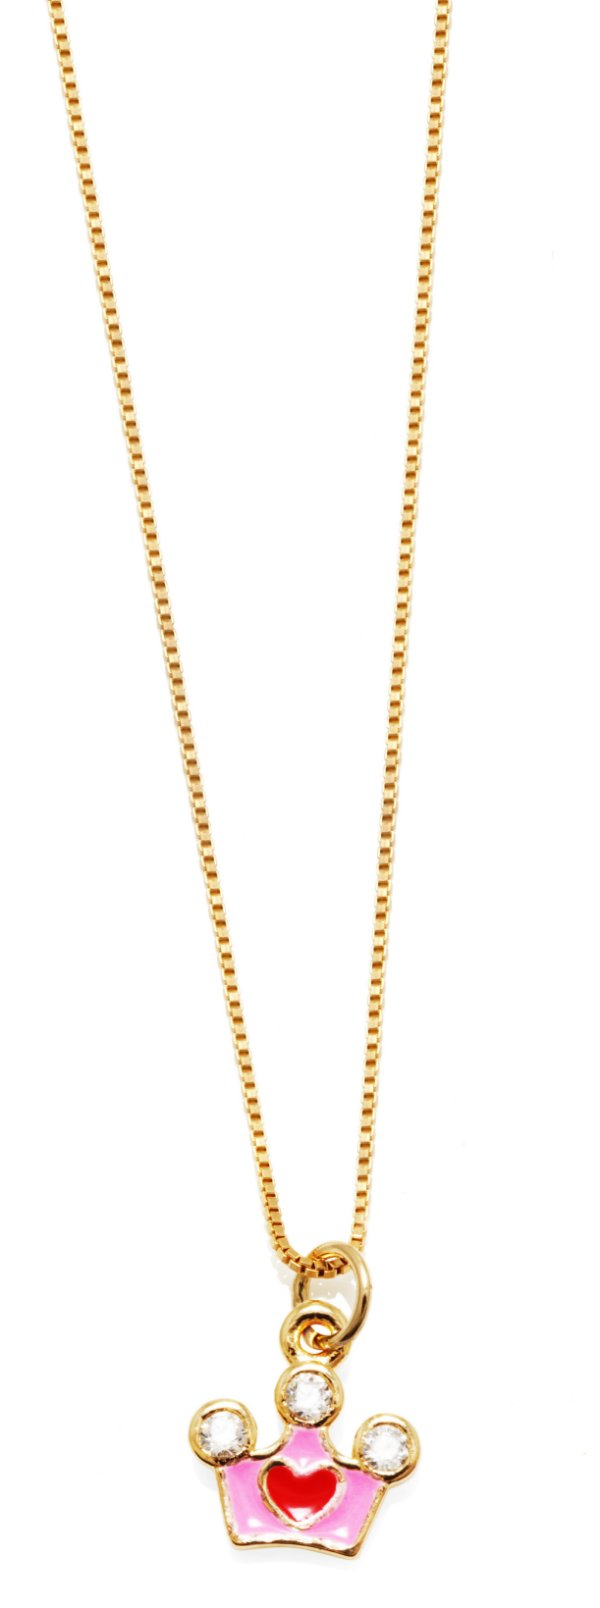 Gargantilha Infantil Coroa Prata Banho de Ouro VD 49.5